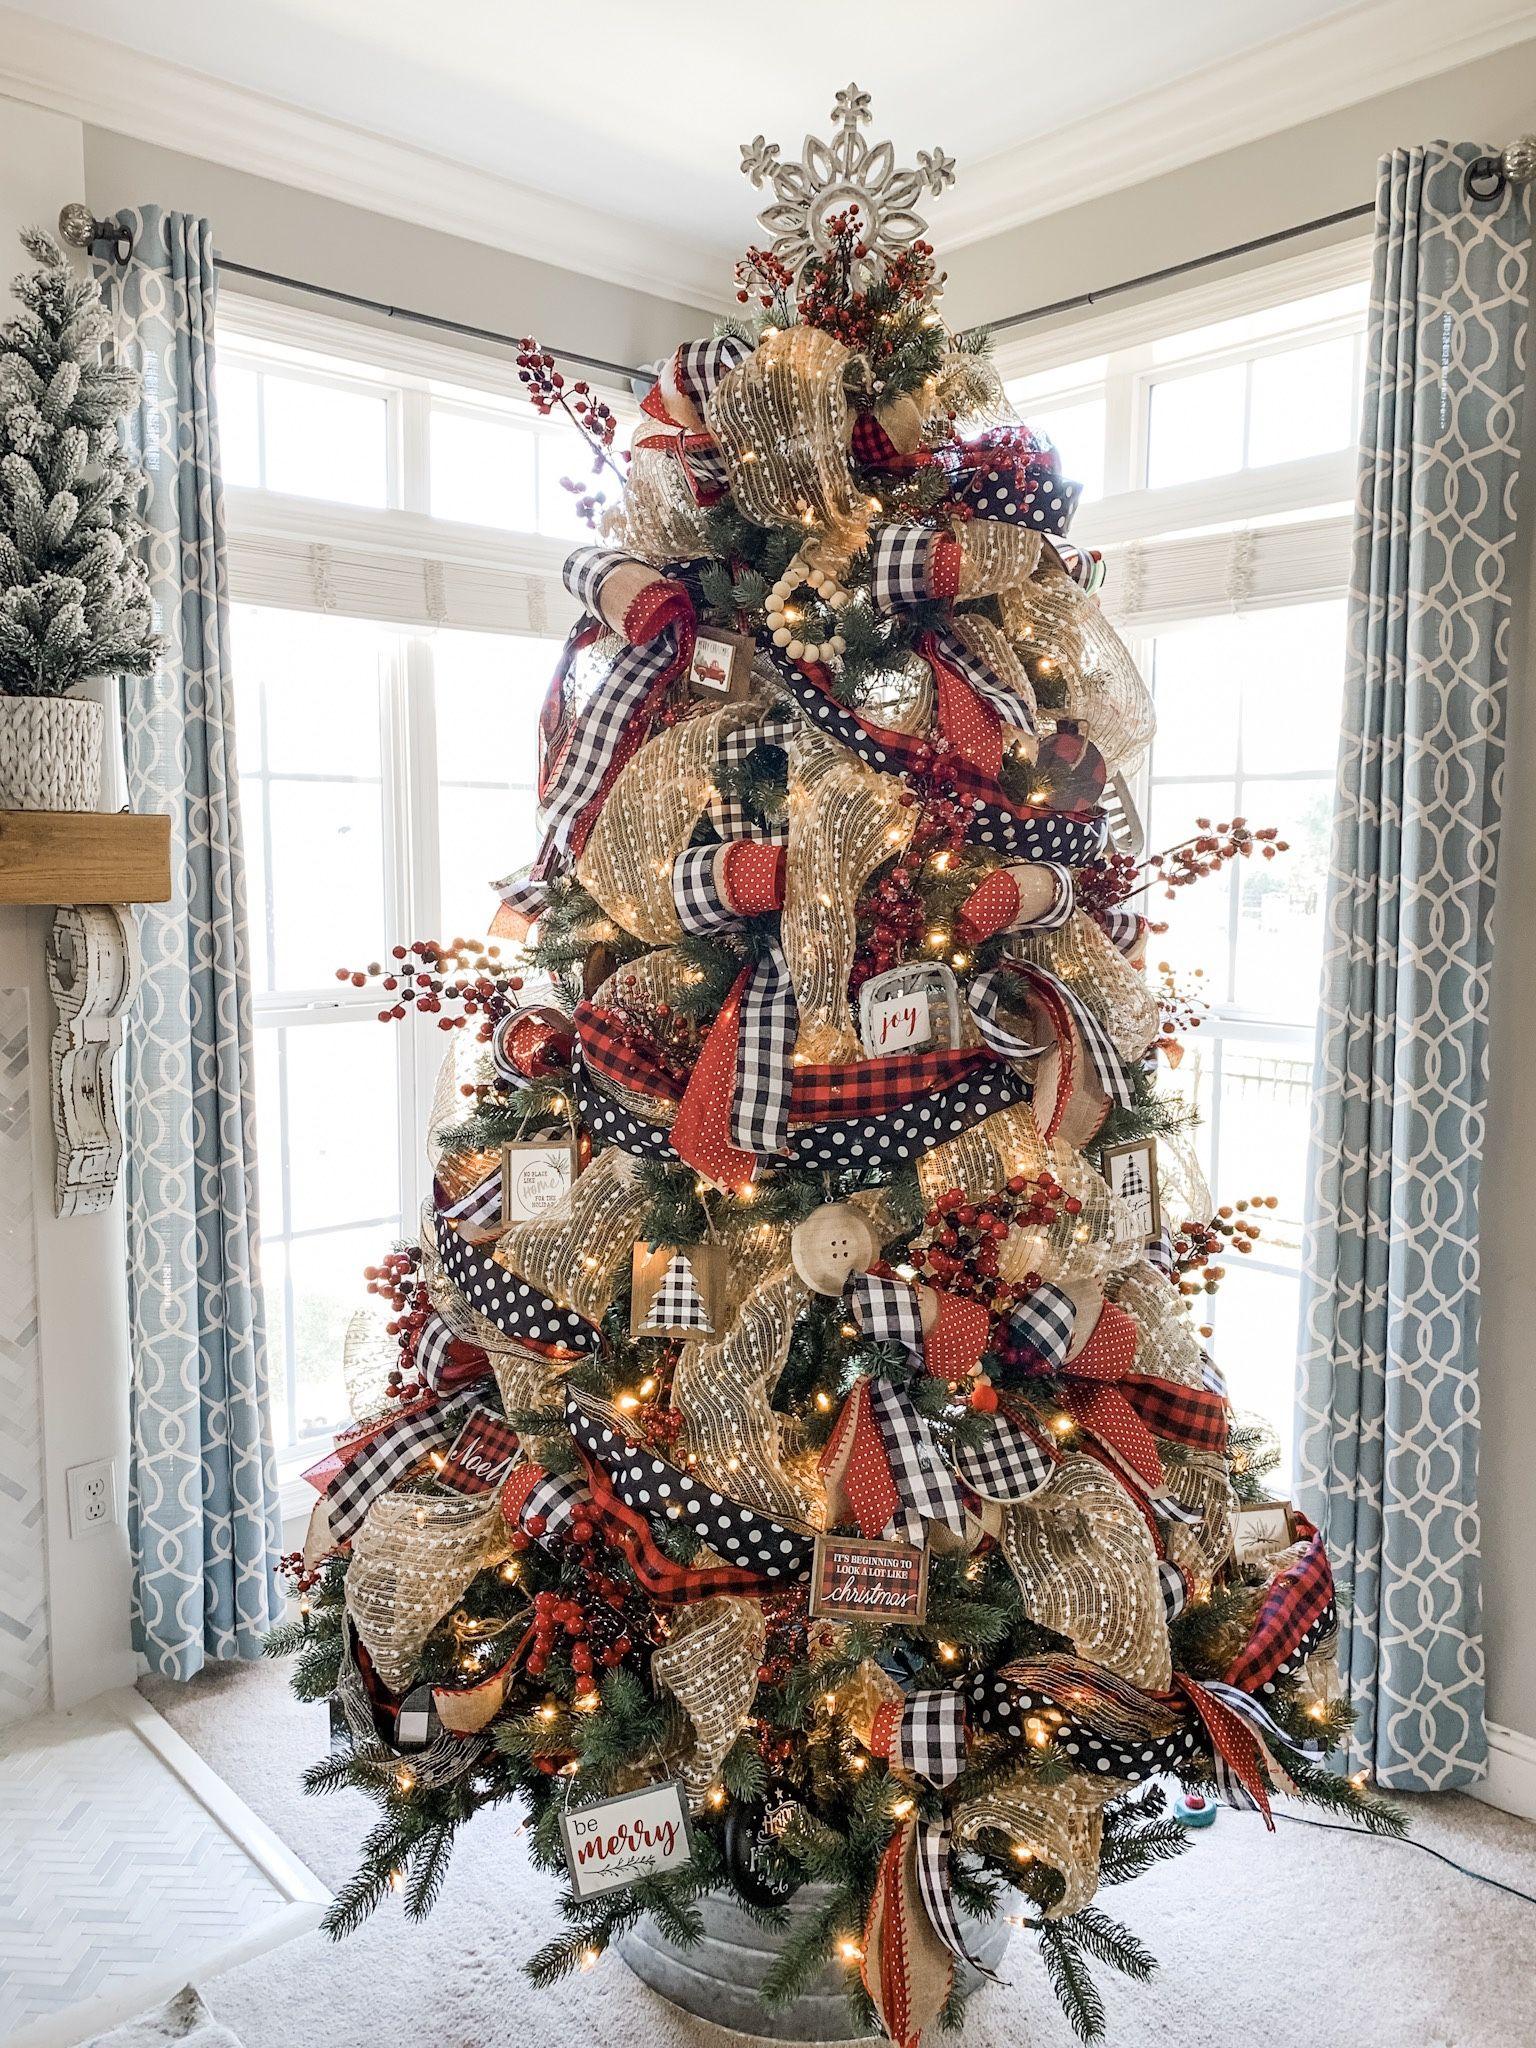 Christmas tree ideas using ribbon! Buffalo check, polka dots and more for a cute combo! #ribbononchristmastreeideas